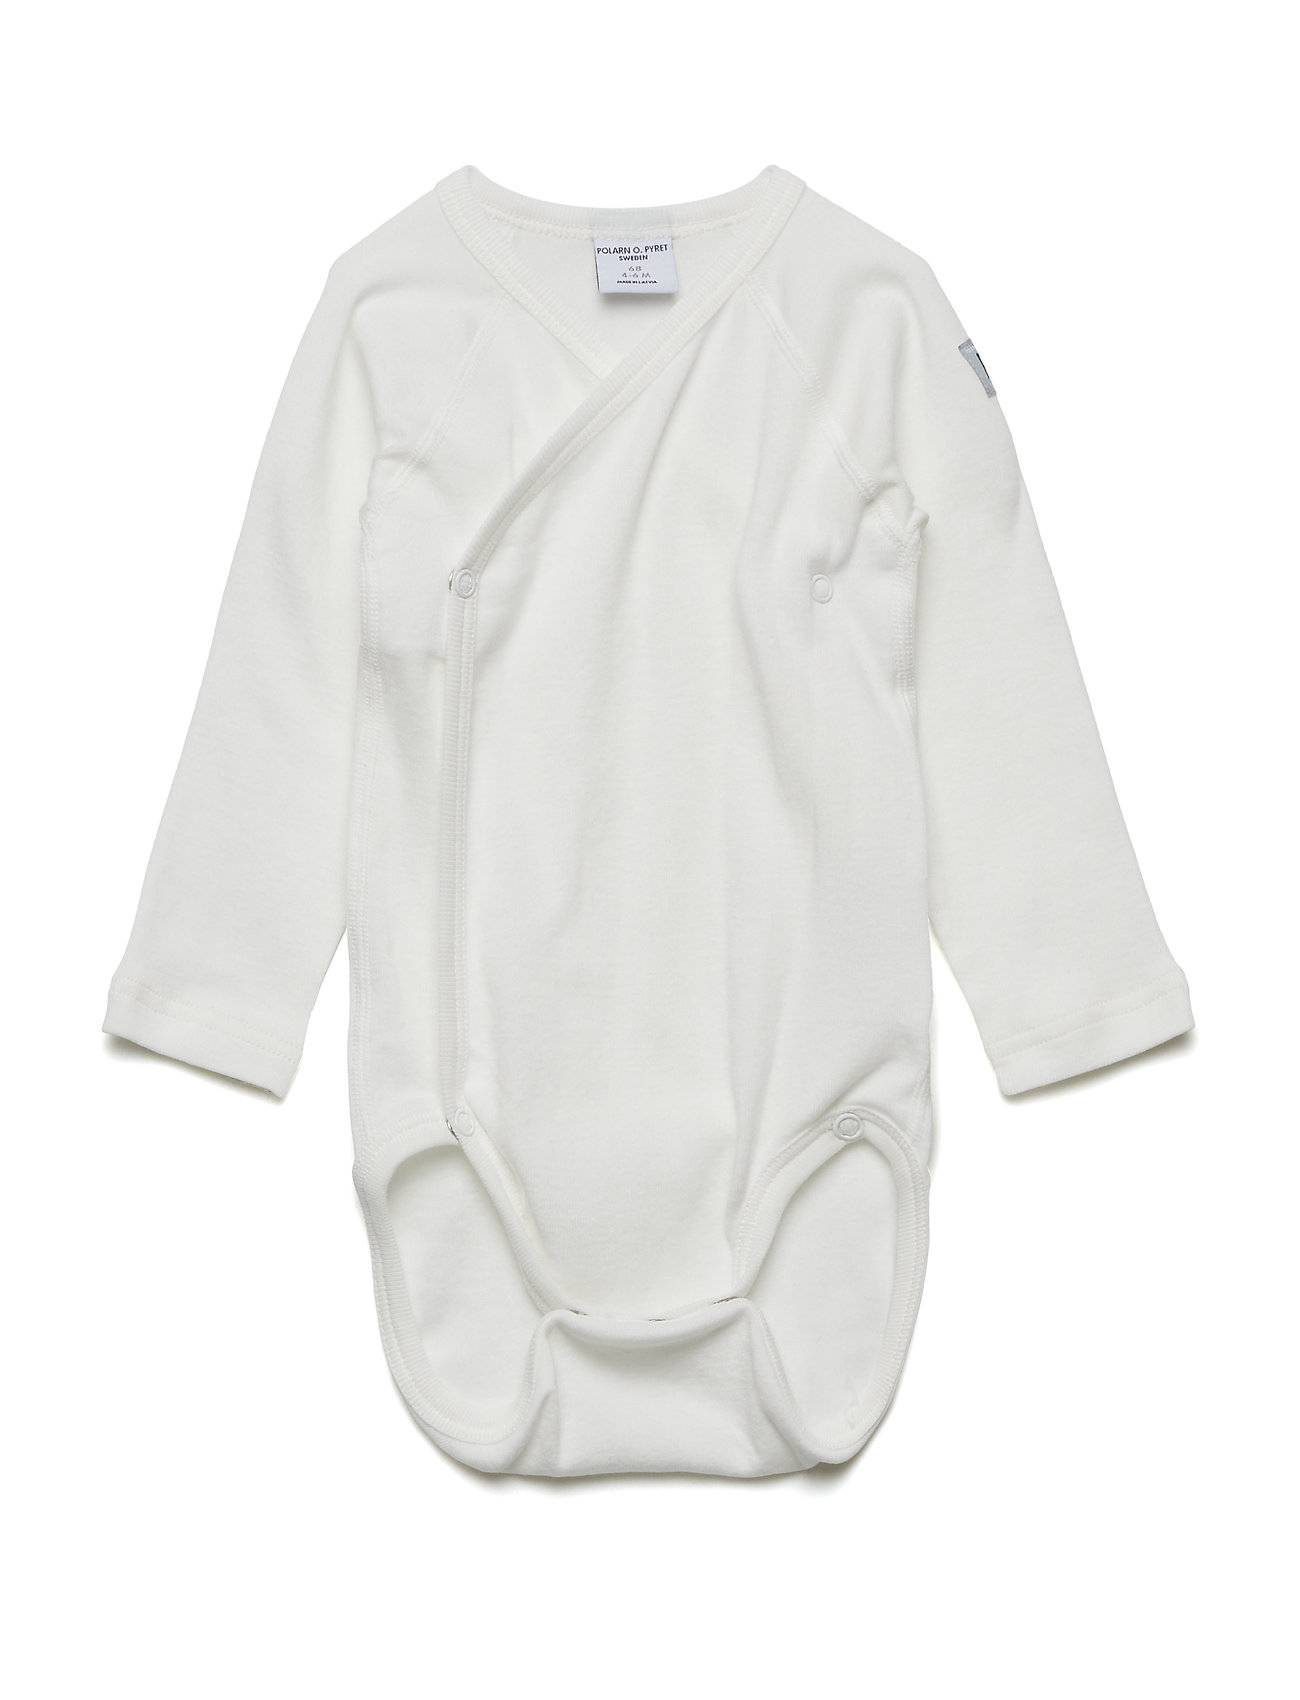 Polarn O. Pyret Body Wrapover Solid Newborn Bodies Long-sleeved Valkoinen